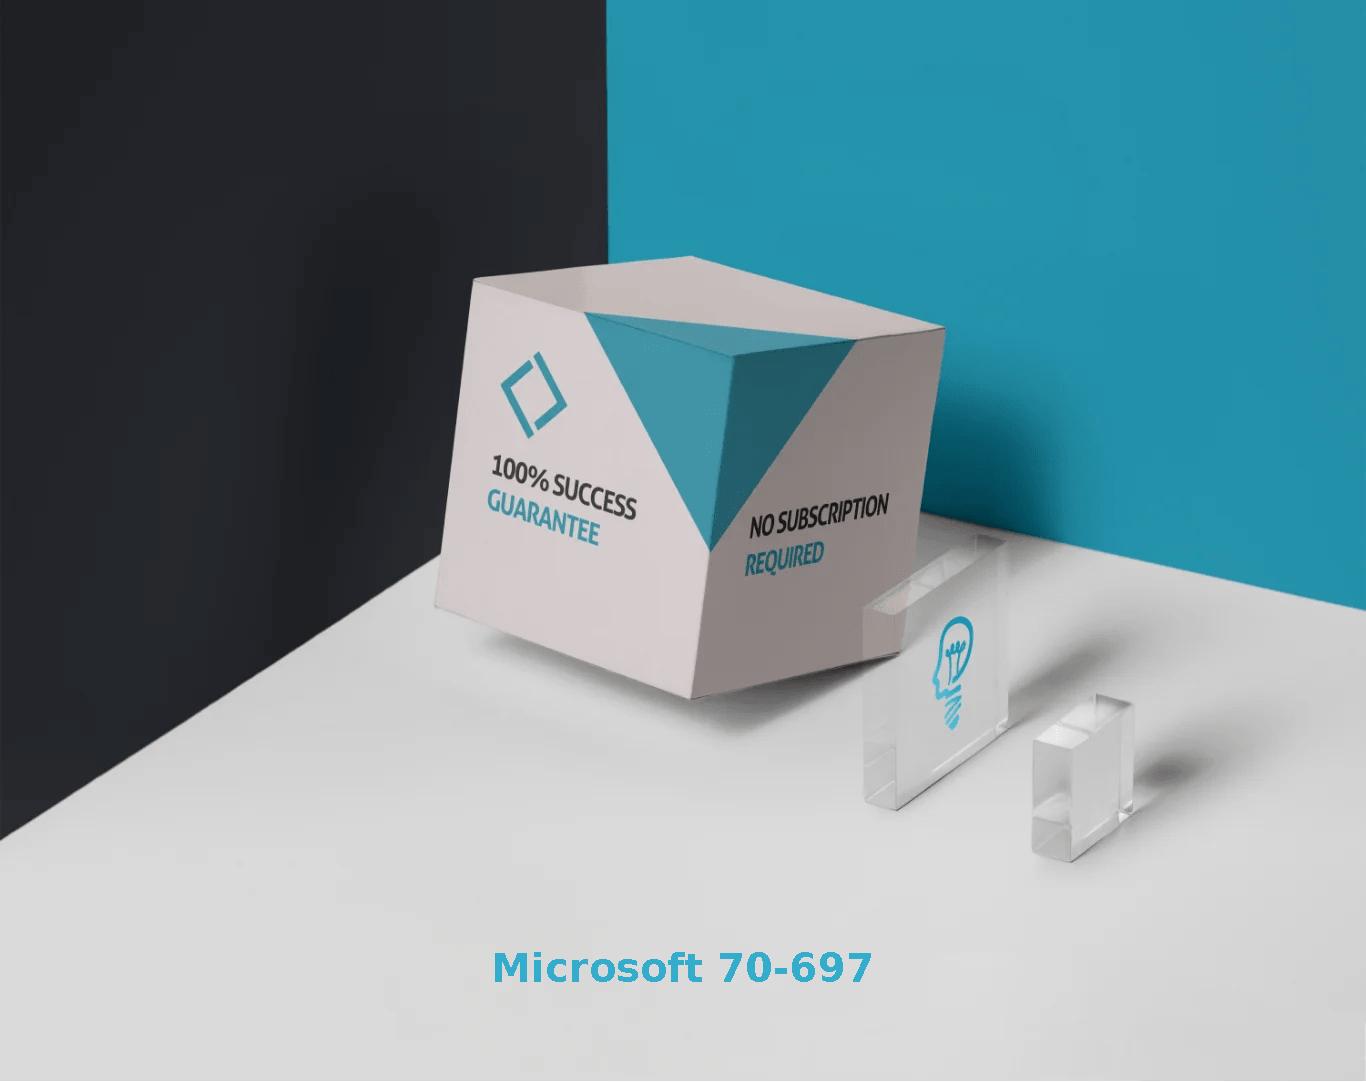 Microsoft 70-697 Exams